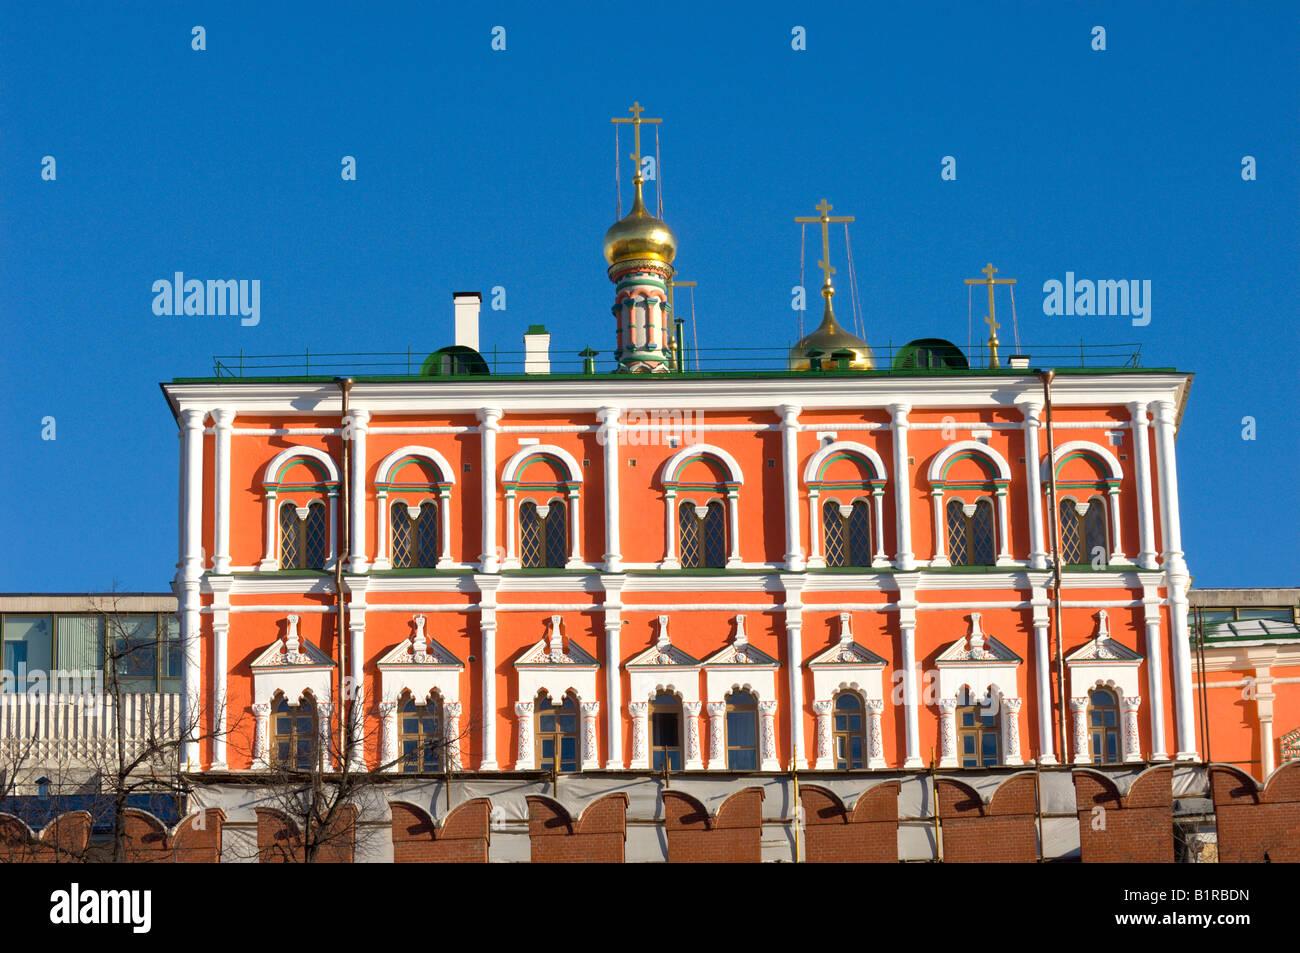 Cupolas of Poteshny Palace The Kemlin Moscow Russia - Stock Image